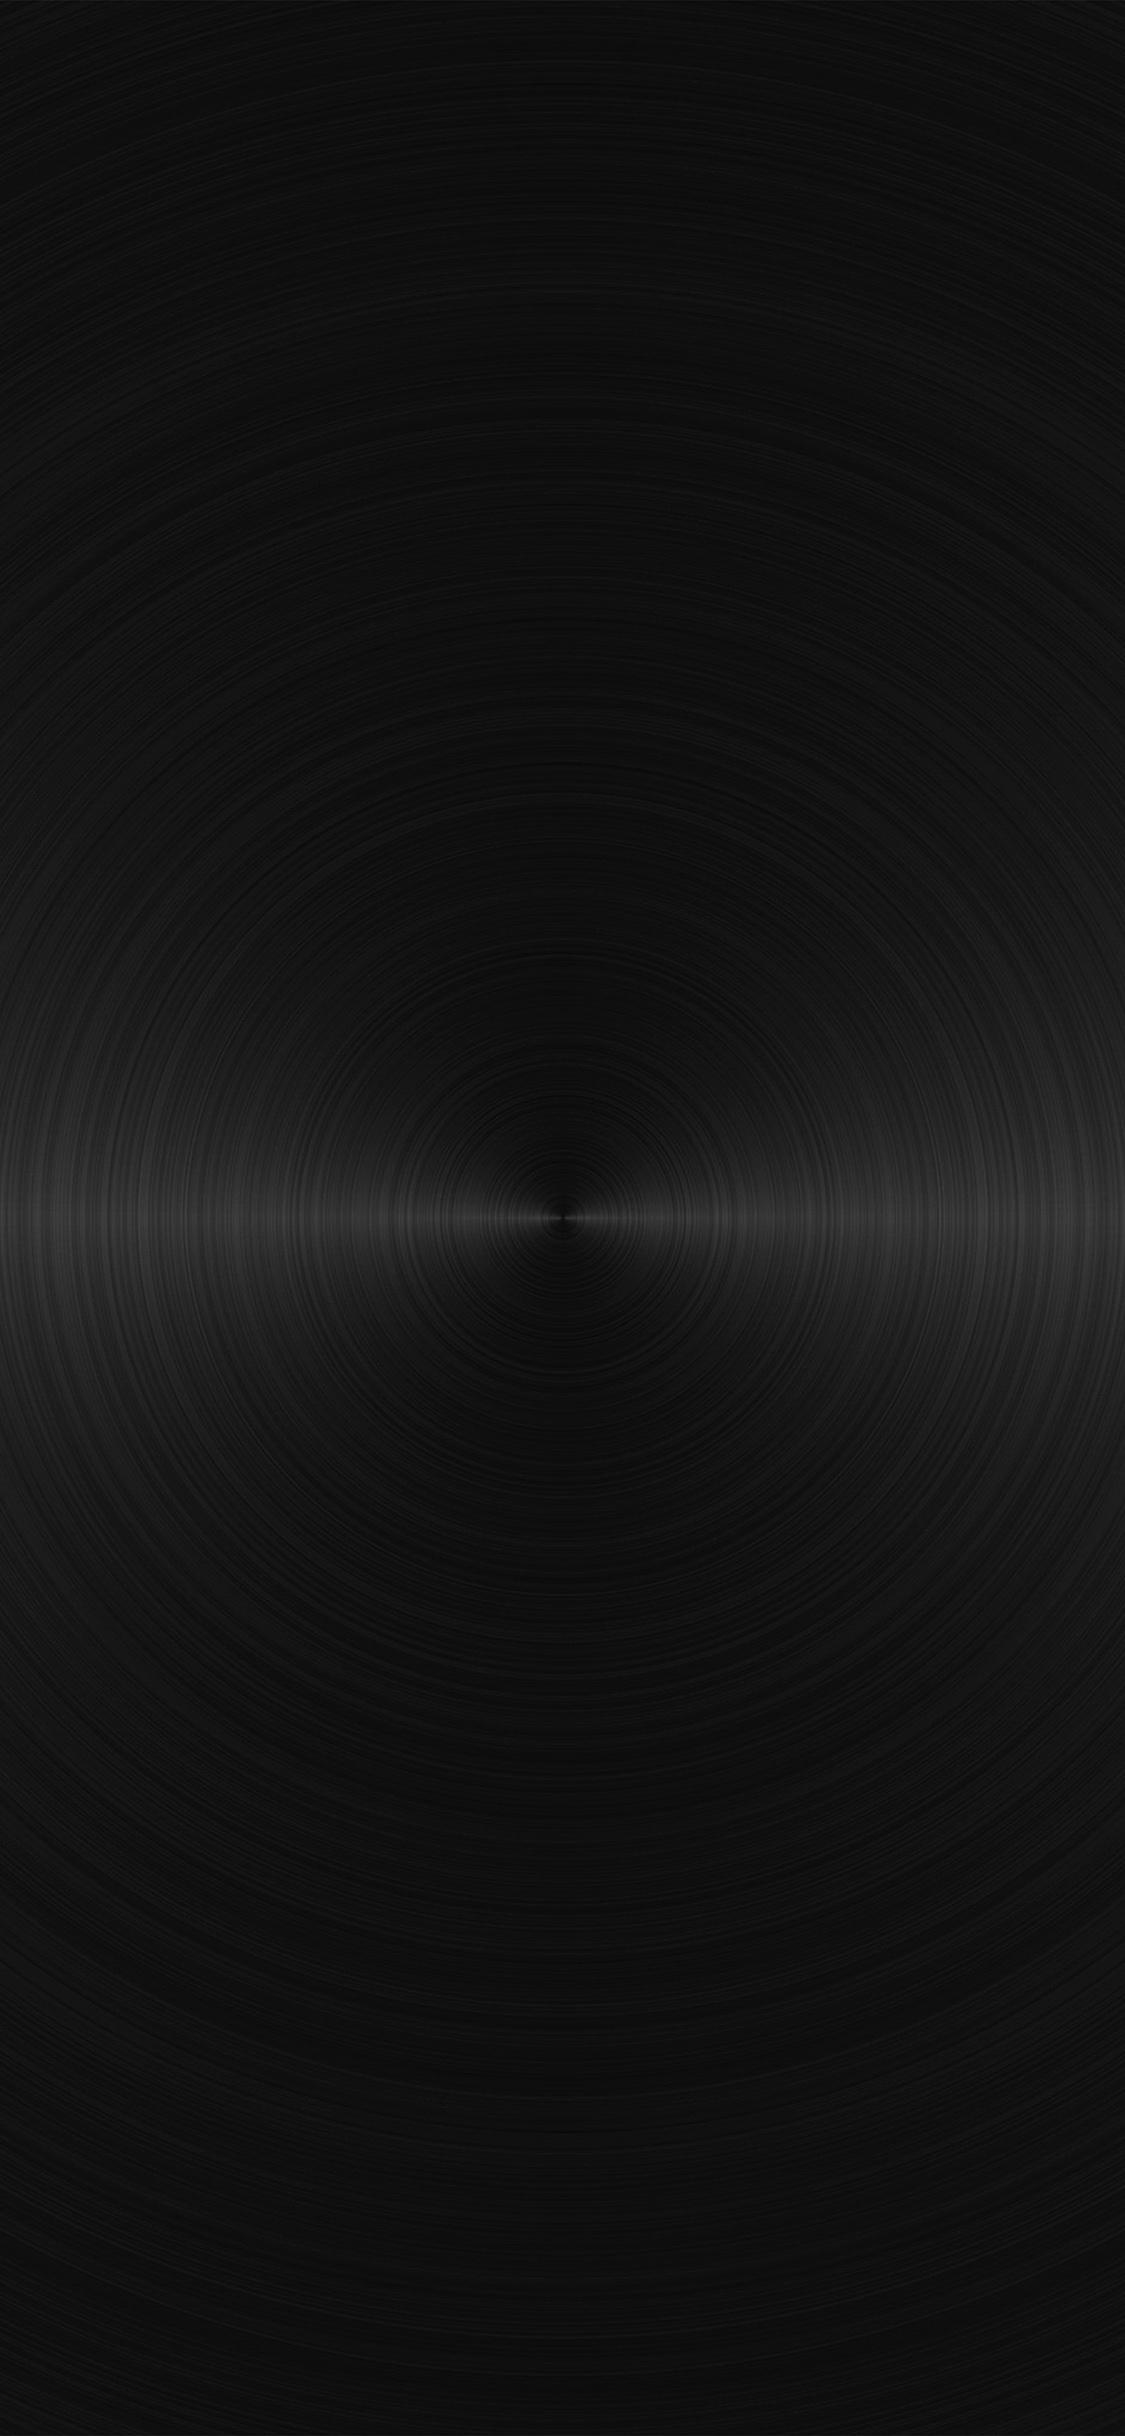 iPhoneXpapers.com-Apple-iPhone-wallpaper-vu16-metal-circle-round-texture-pattern